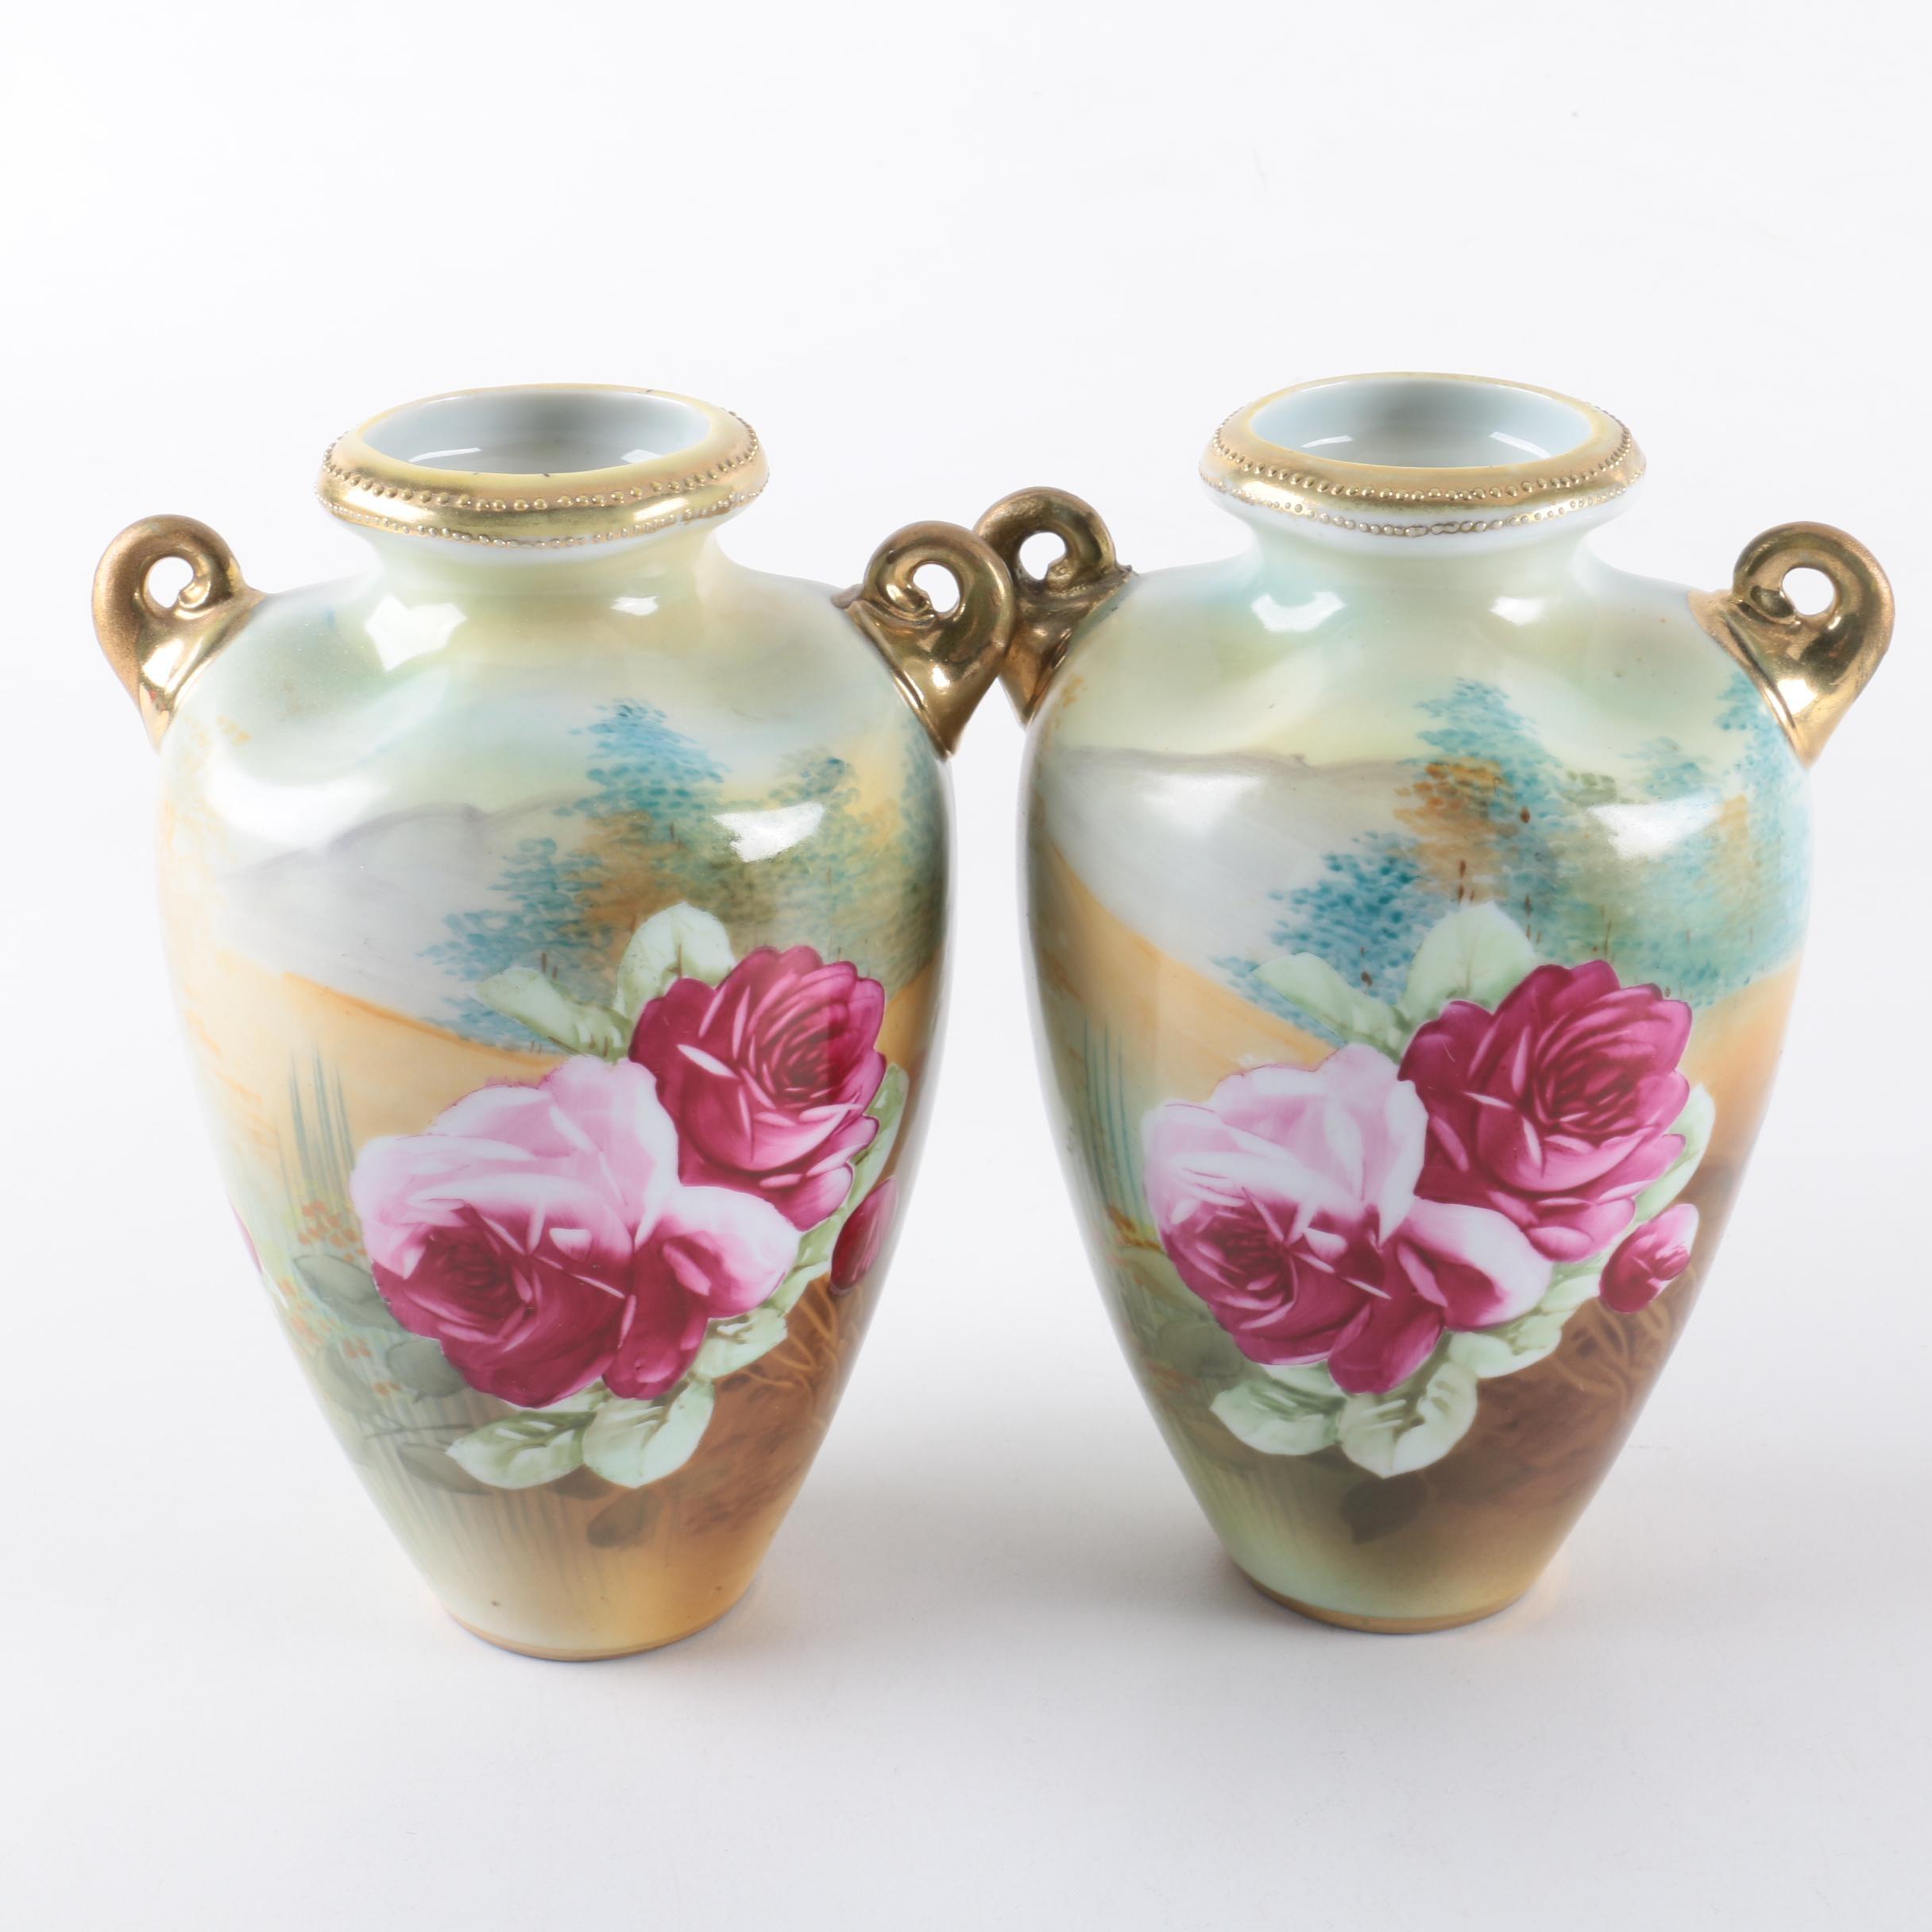 Antique Hand-Painted Nippon Porcelain Vases